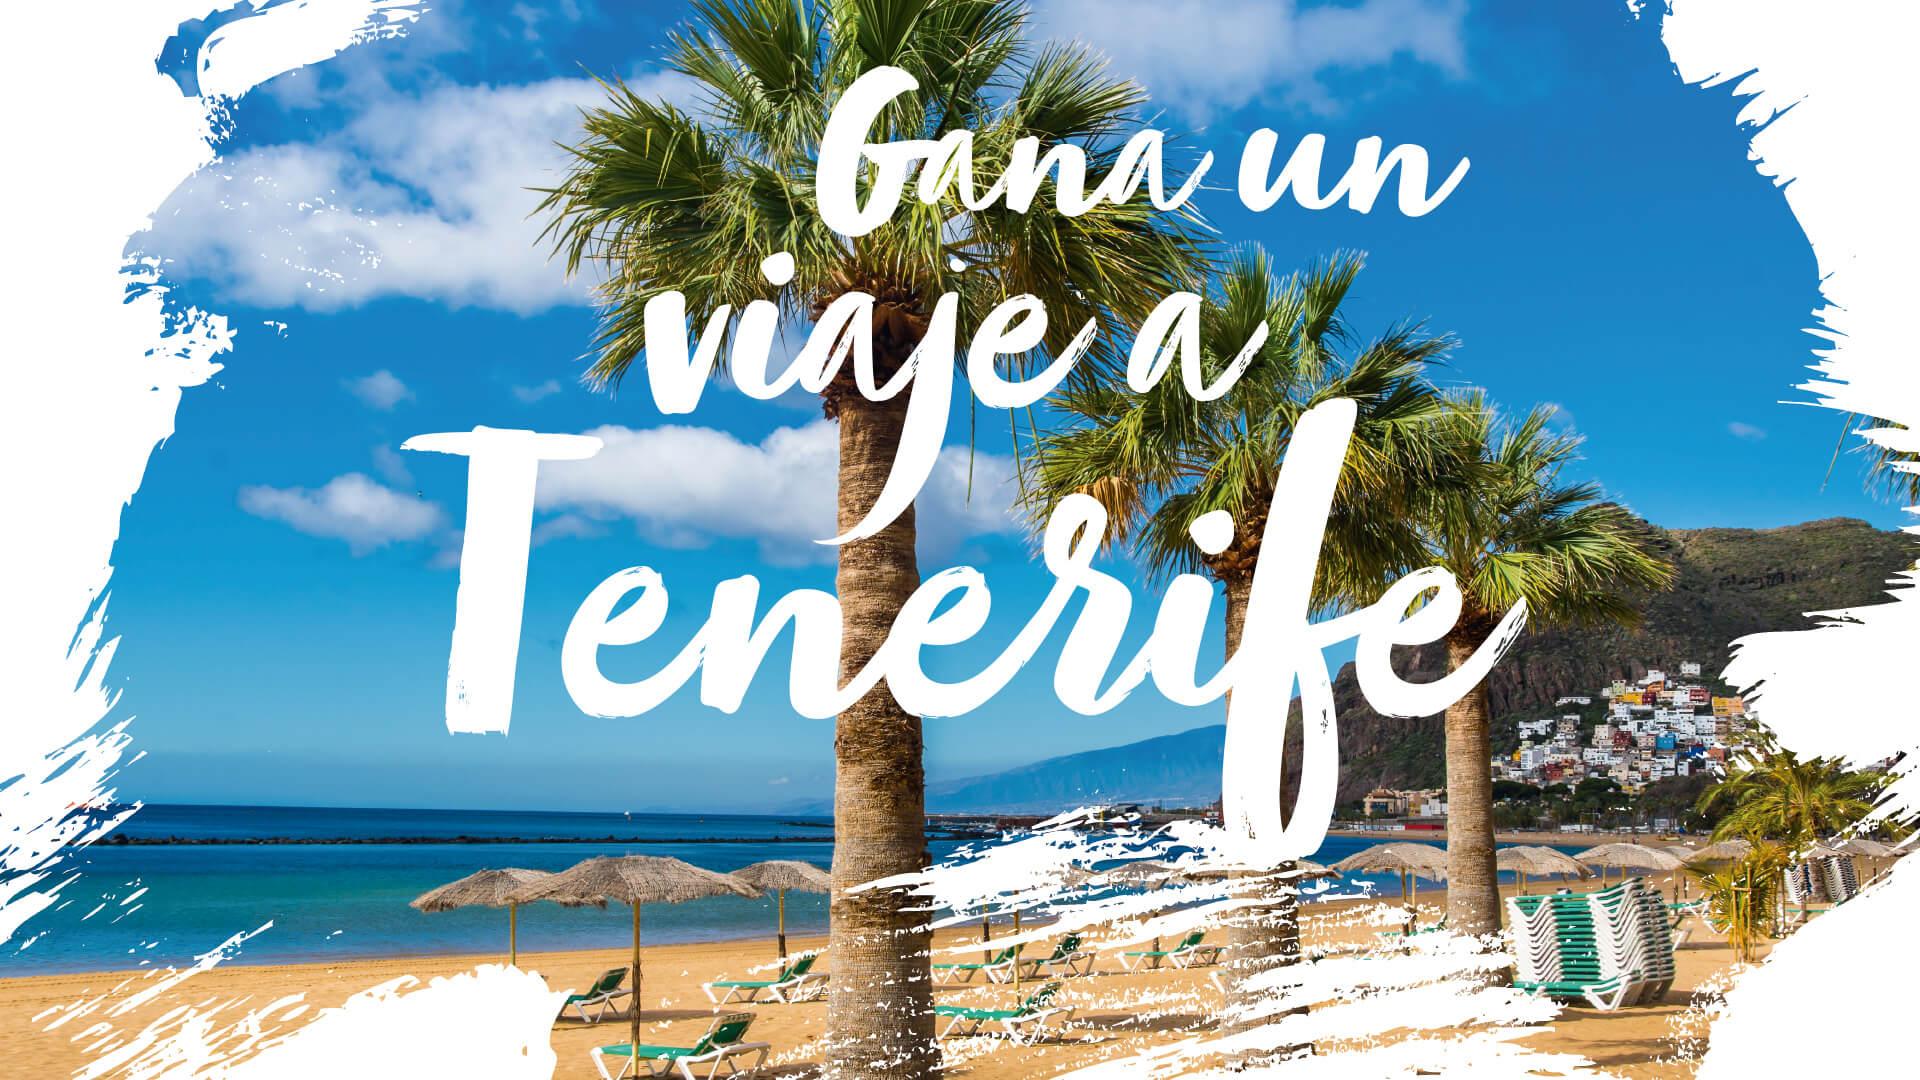 Vamos a Tenerife